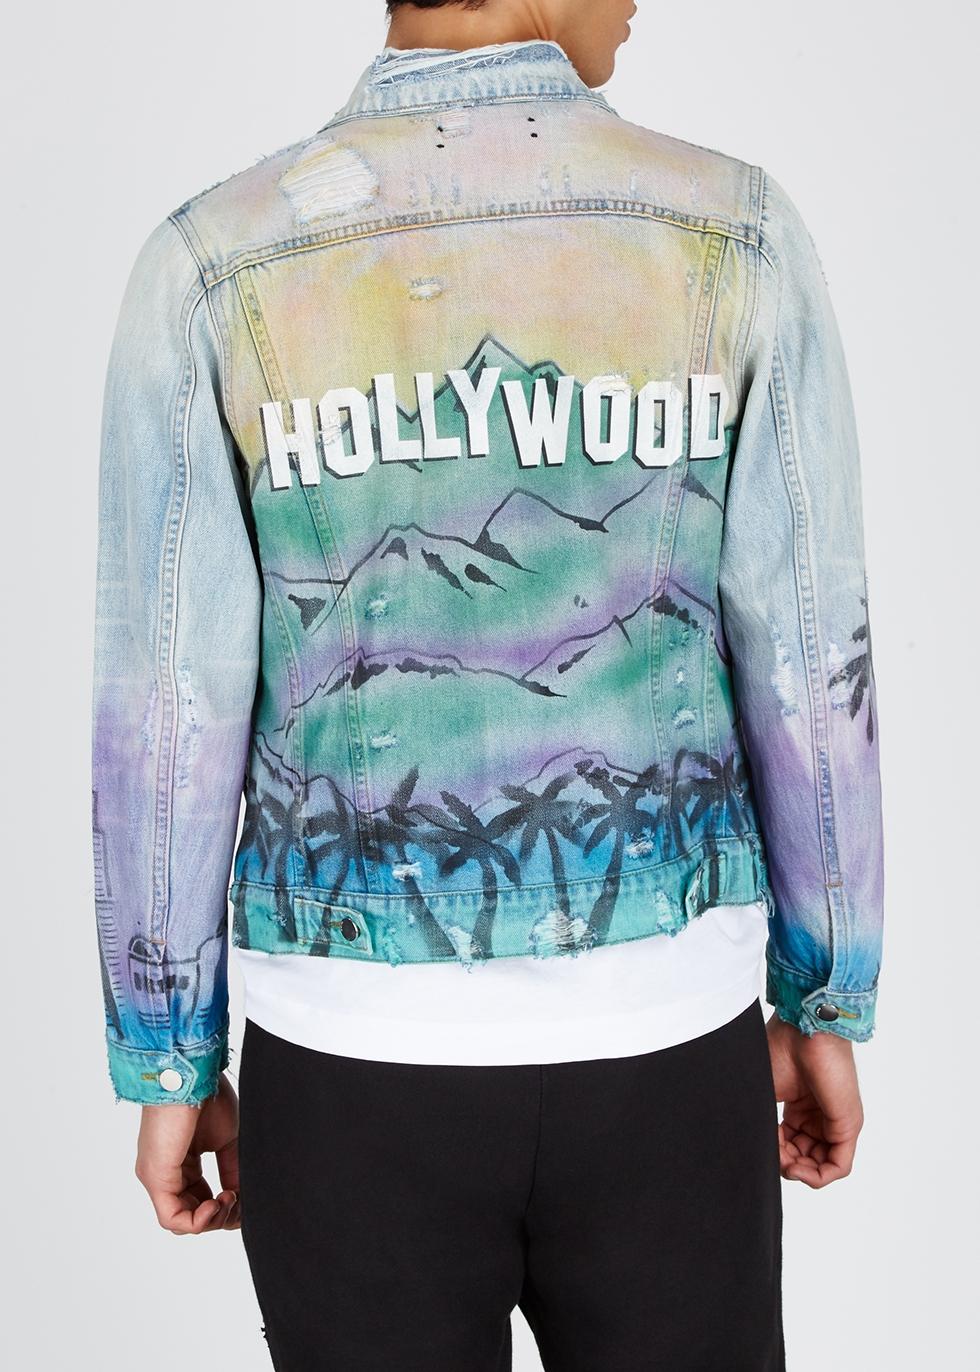 Hollywood-print denim jacket - Amiri